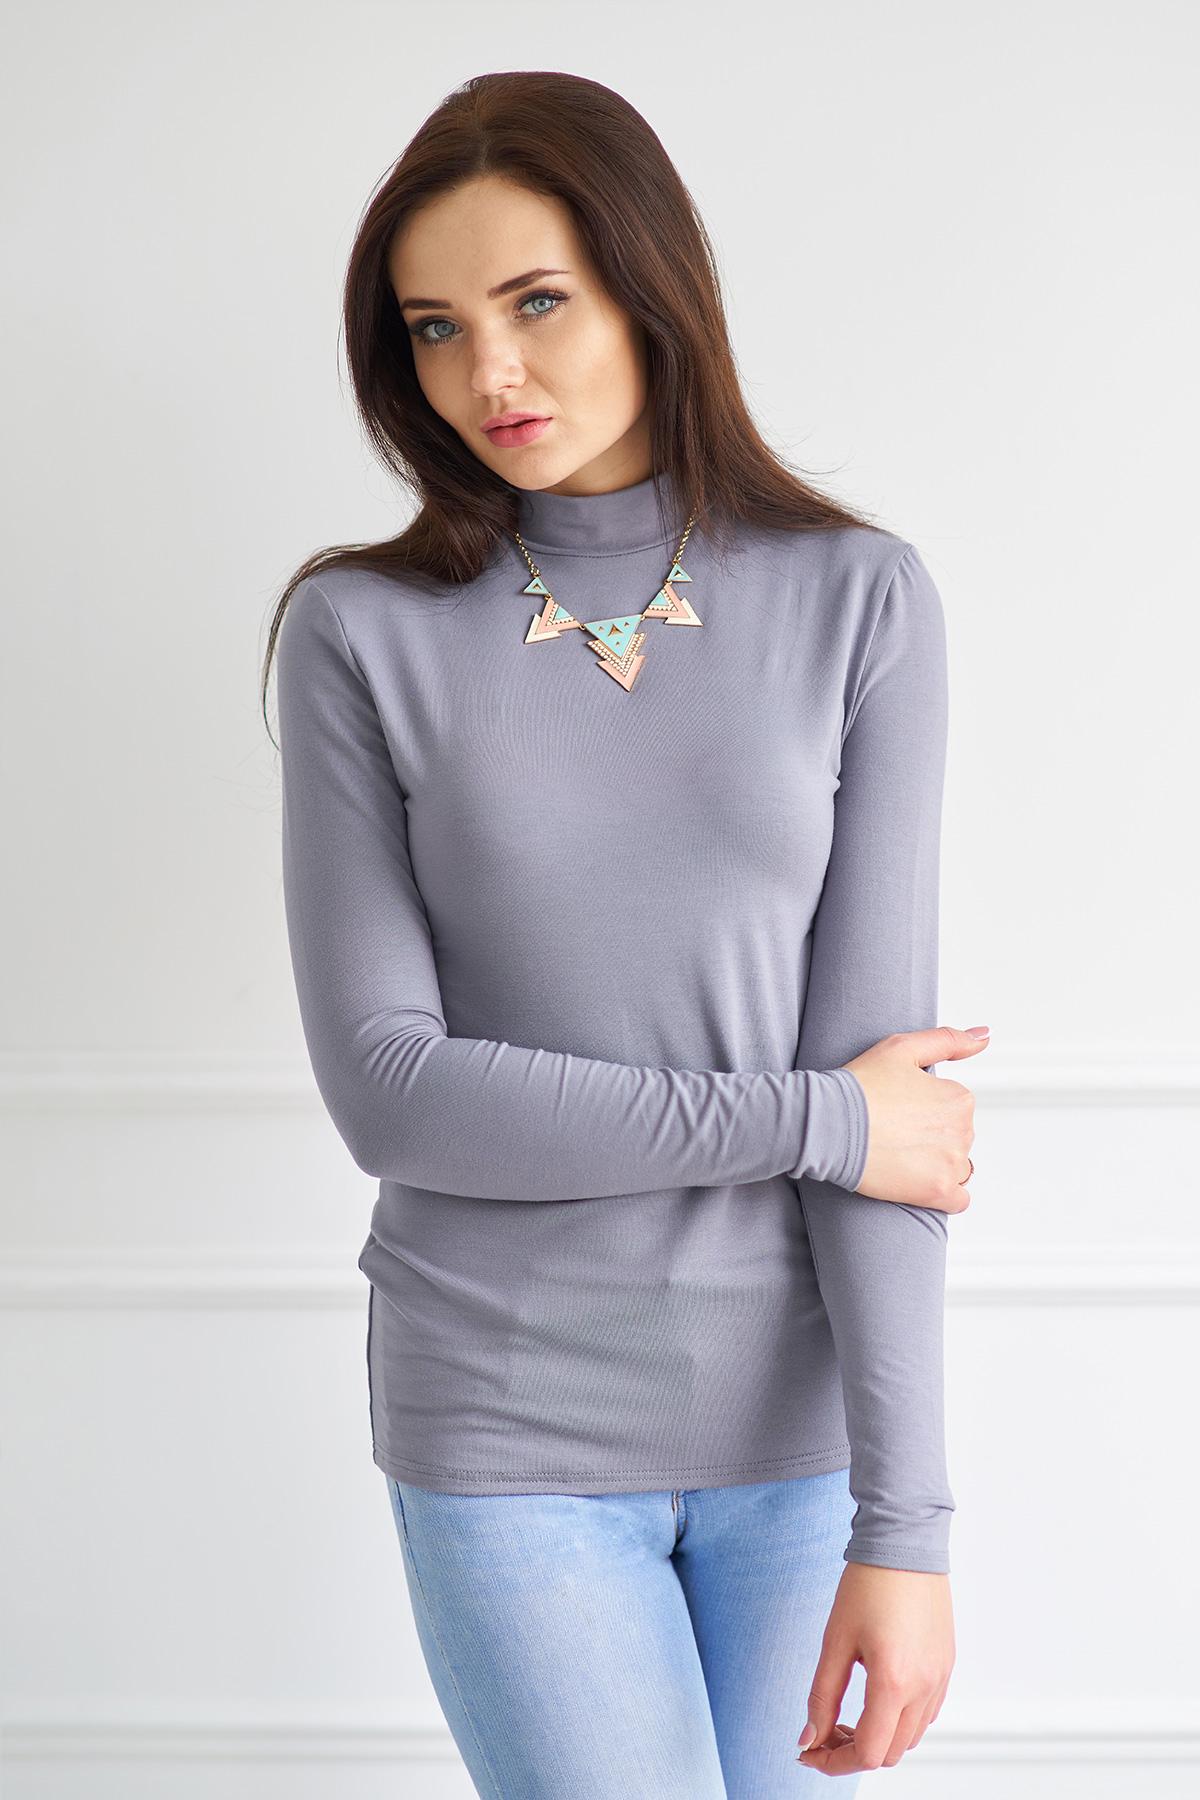 Жен. водолазка арт. 19-0012 Серый р. 54 - Женская одежда артикул: 28548